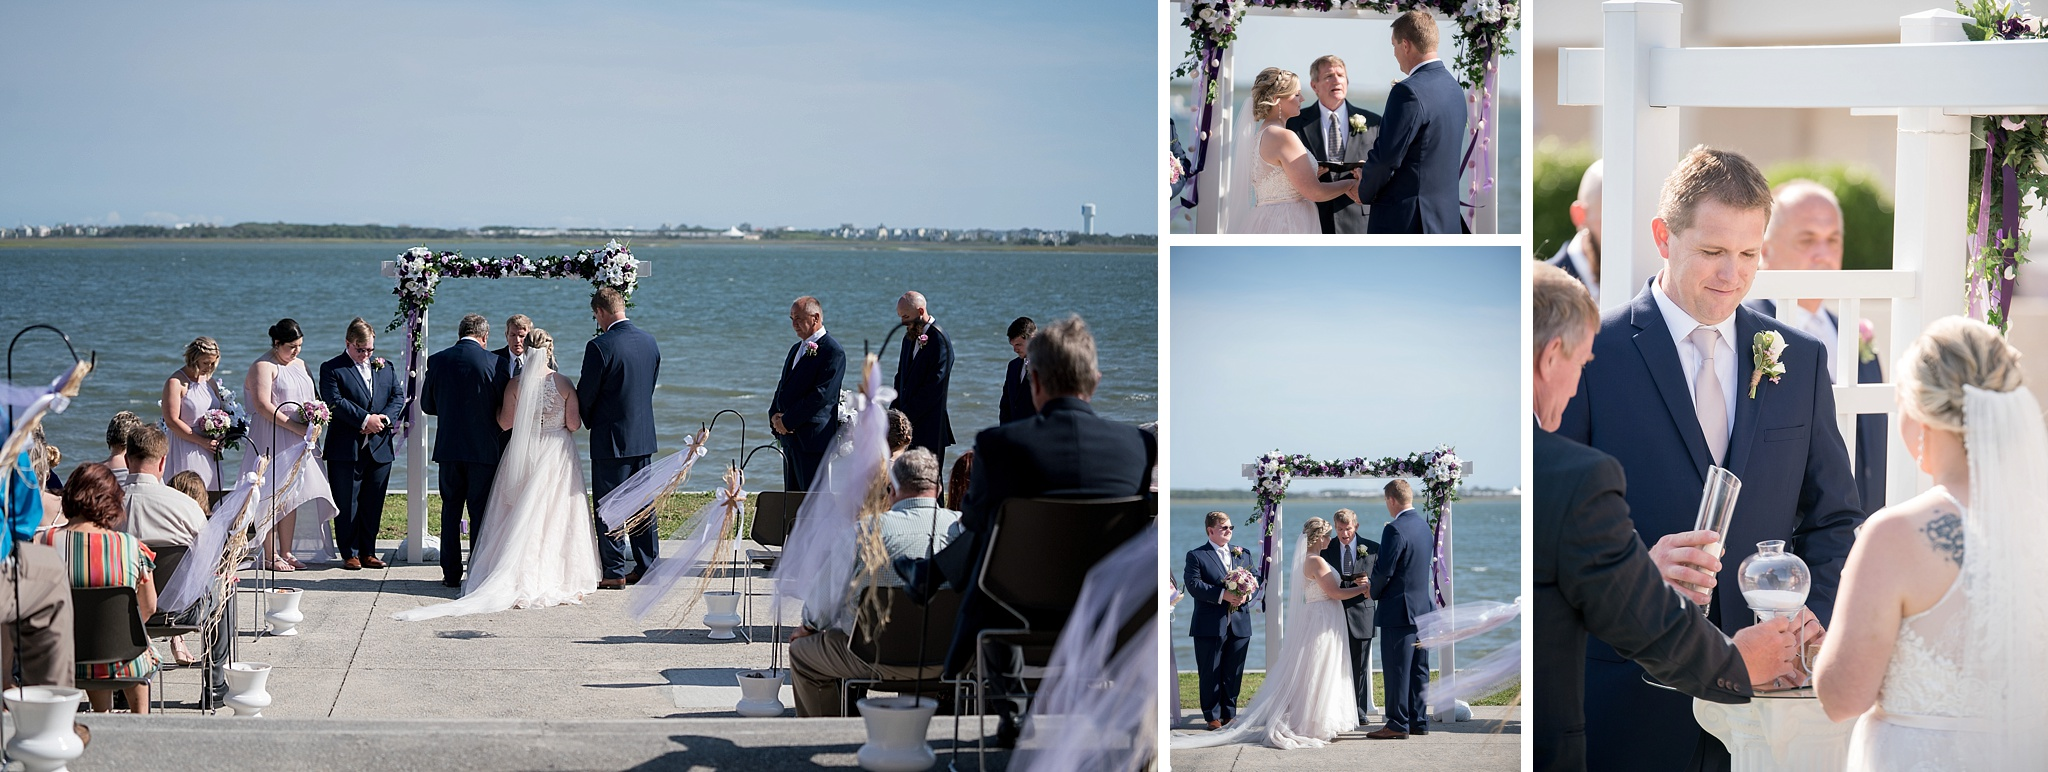 Crystal-Coast-Wedding-Photographer-023.jpg